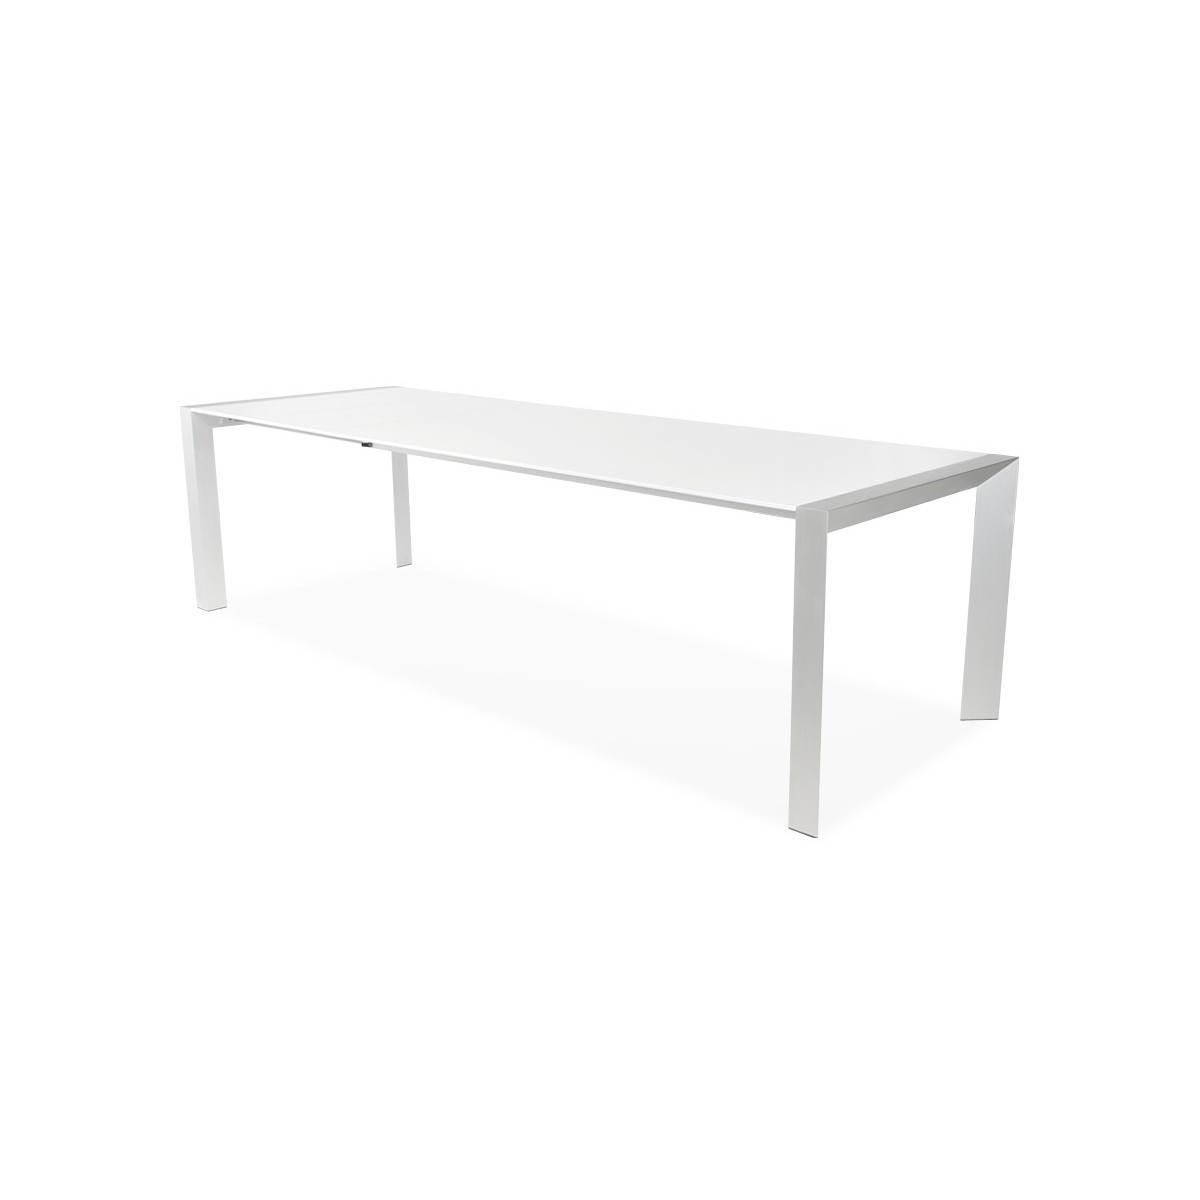 table design avec rallonge fiona en bois laque et aluminium brosse 190 270cmx95cmx75cm blanc amp story 3487